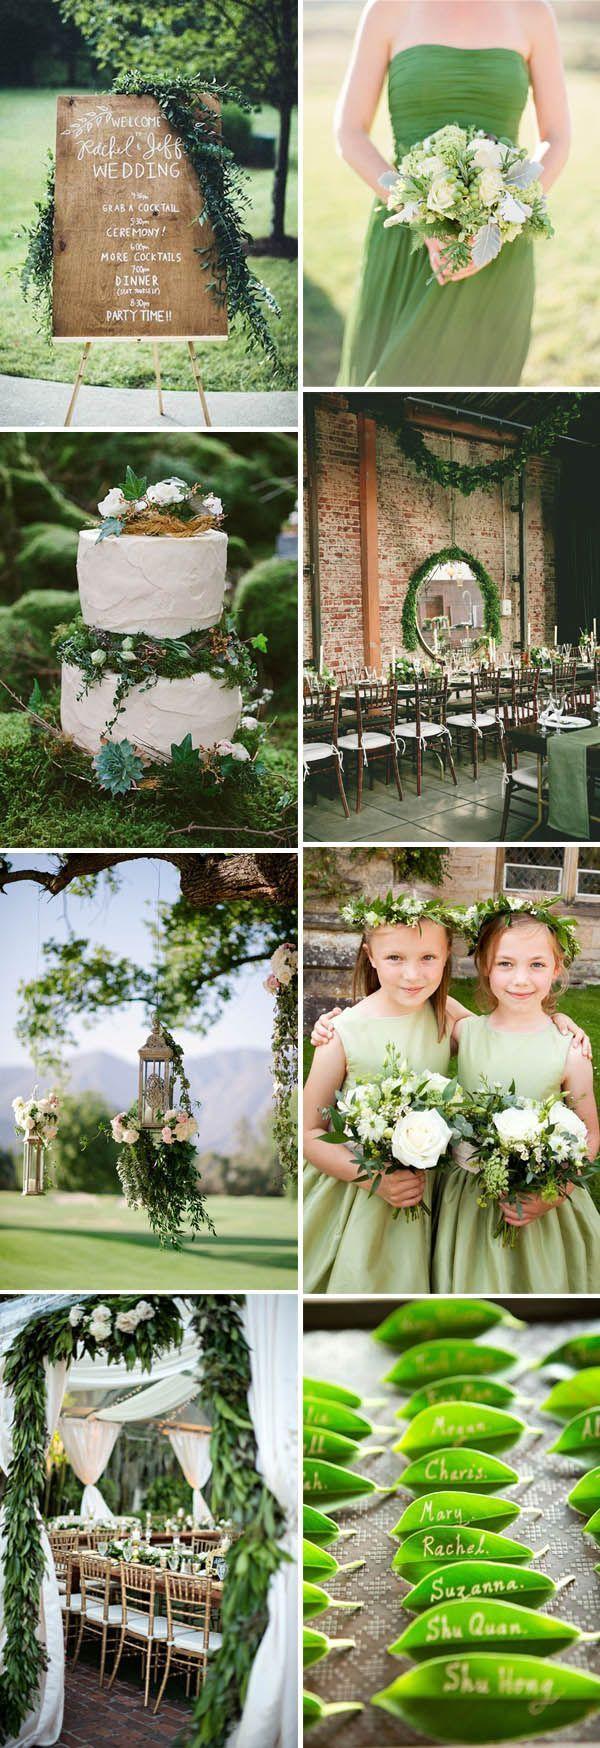 30 amazing greenery wedding ideas for 2016